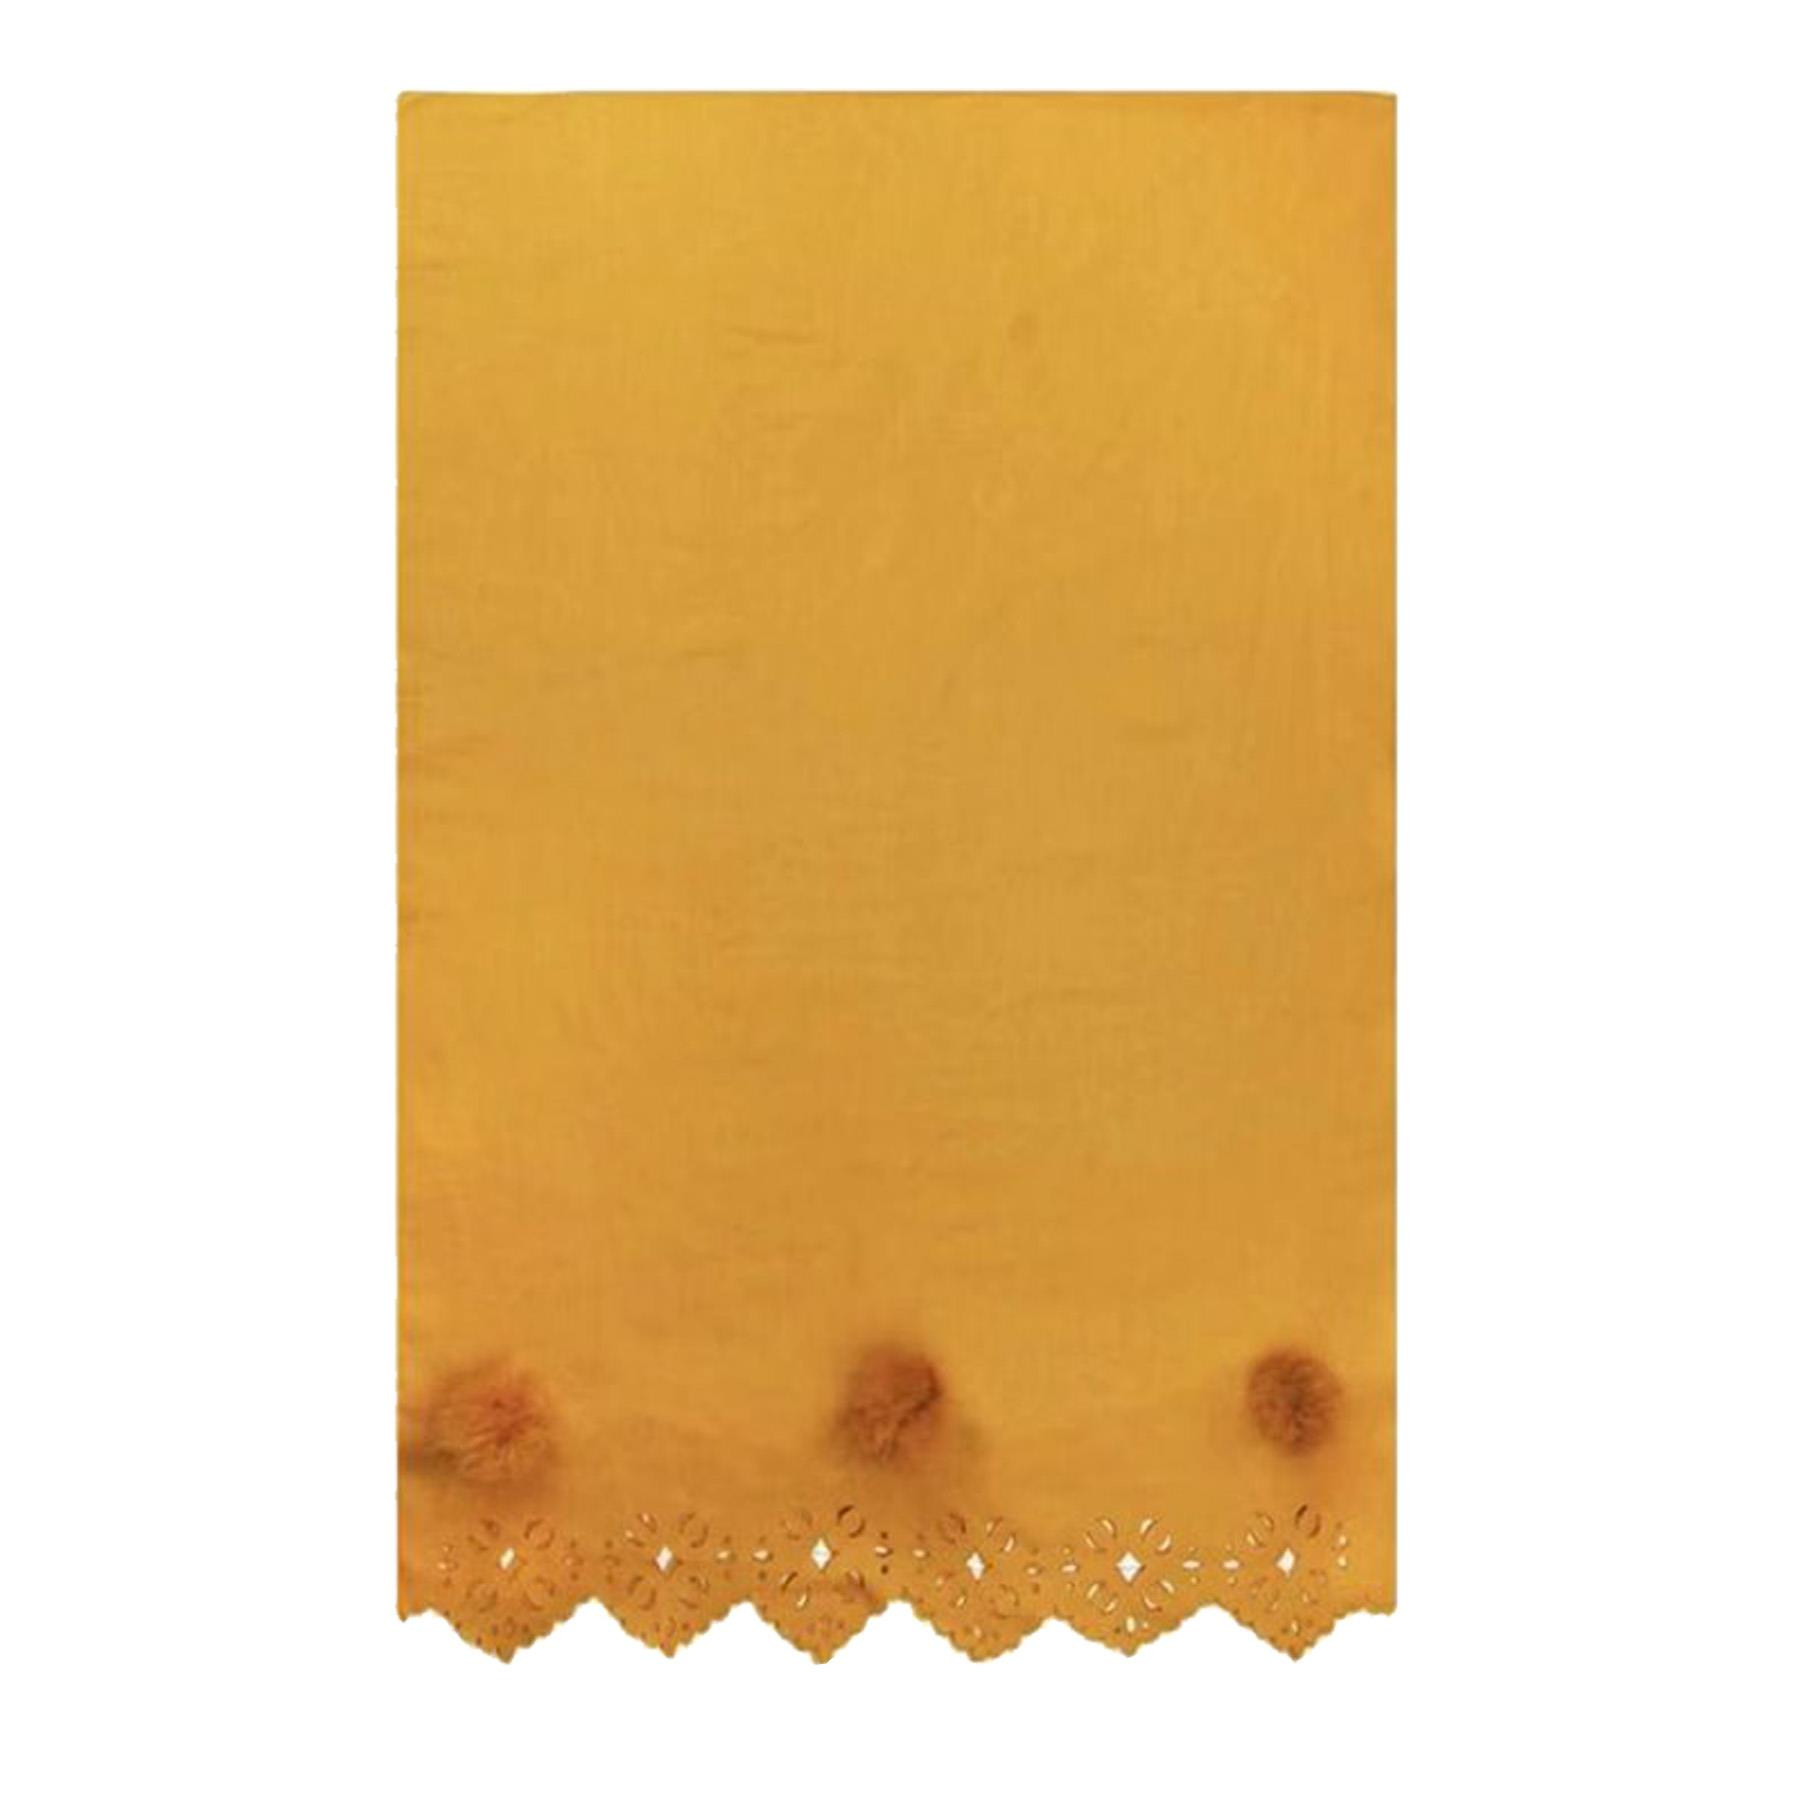 New-Hollow-Detail-Fluffy-Pom-Poms-Ladies-Angora-Viscose-Scarves thumbnail 8